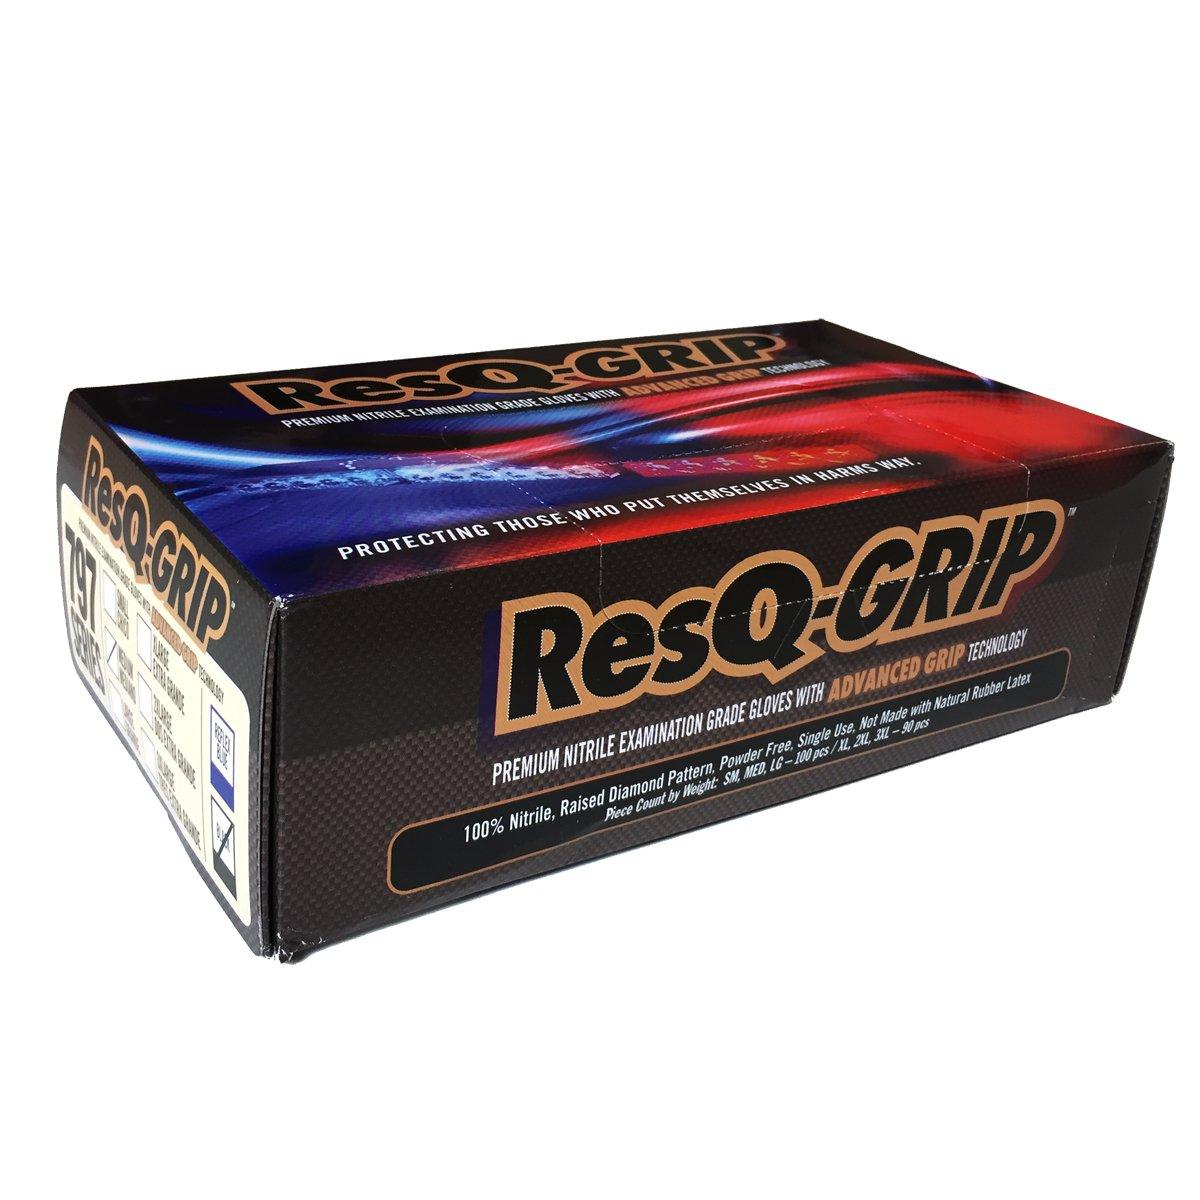 RESQ-GRIP ADVANCED GRIP TEXTURED GLOVES- MEDIUM